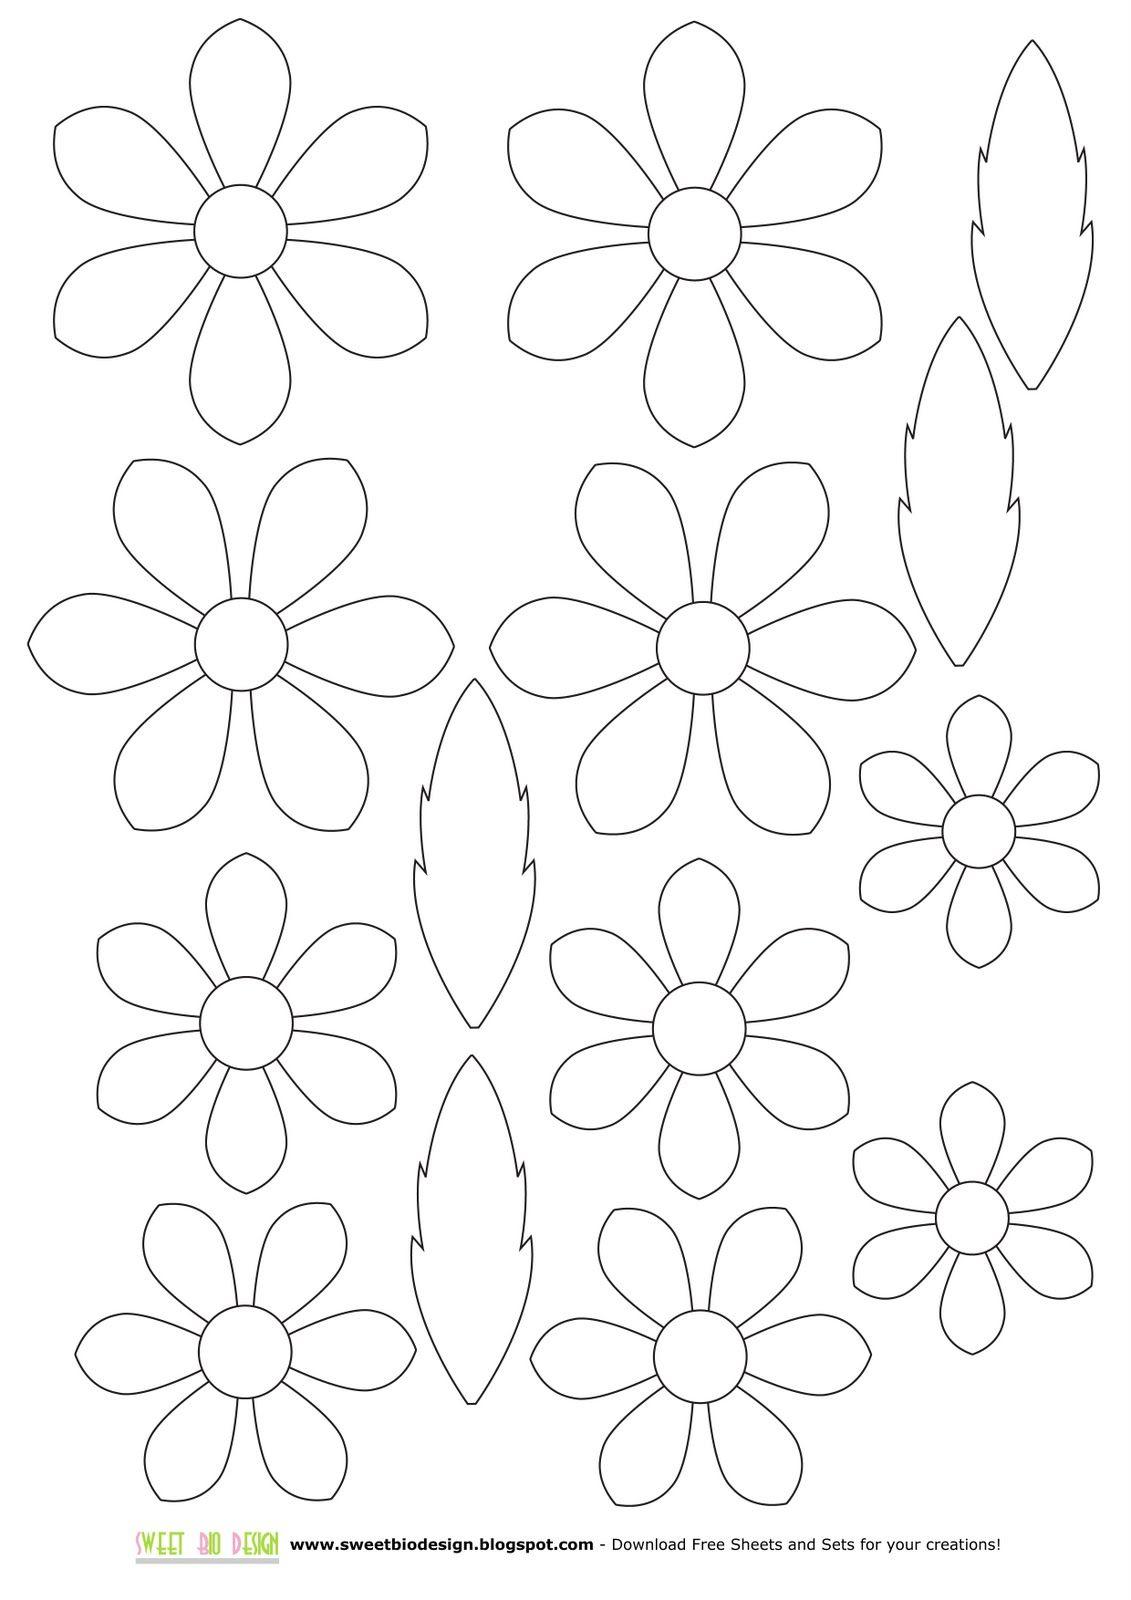 fiori 5 petali - cerca con google   showzinha   pinterest   shirin